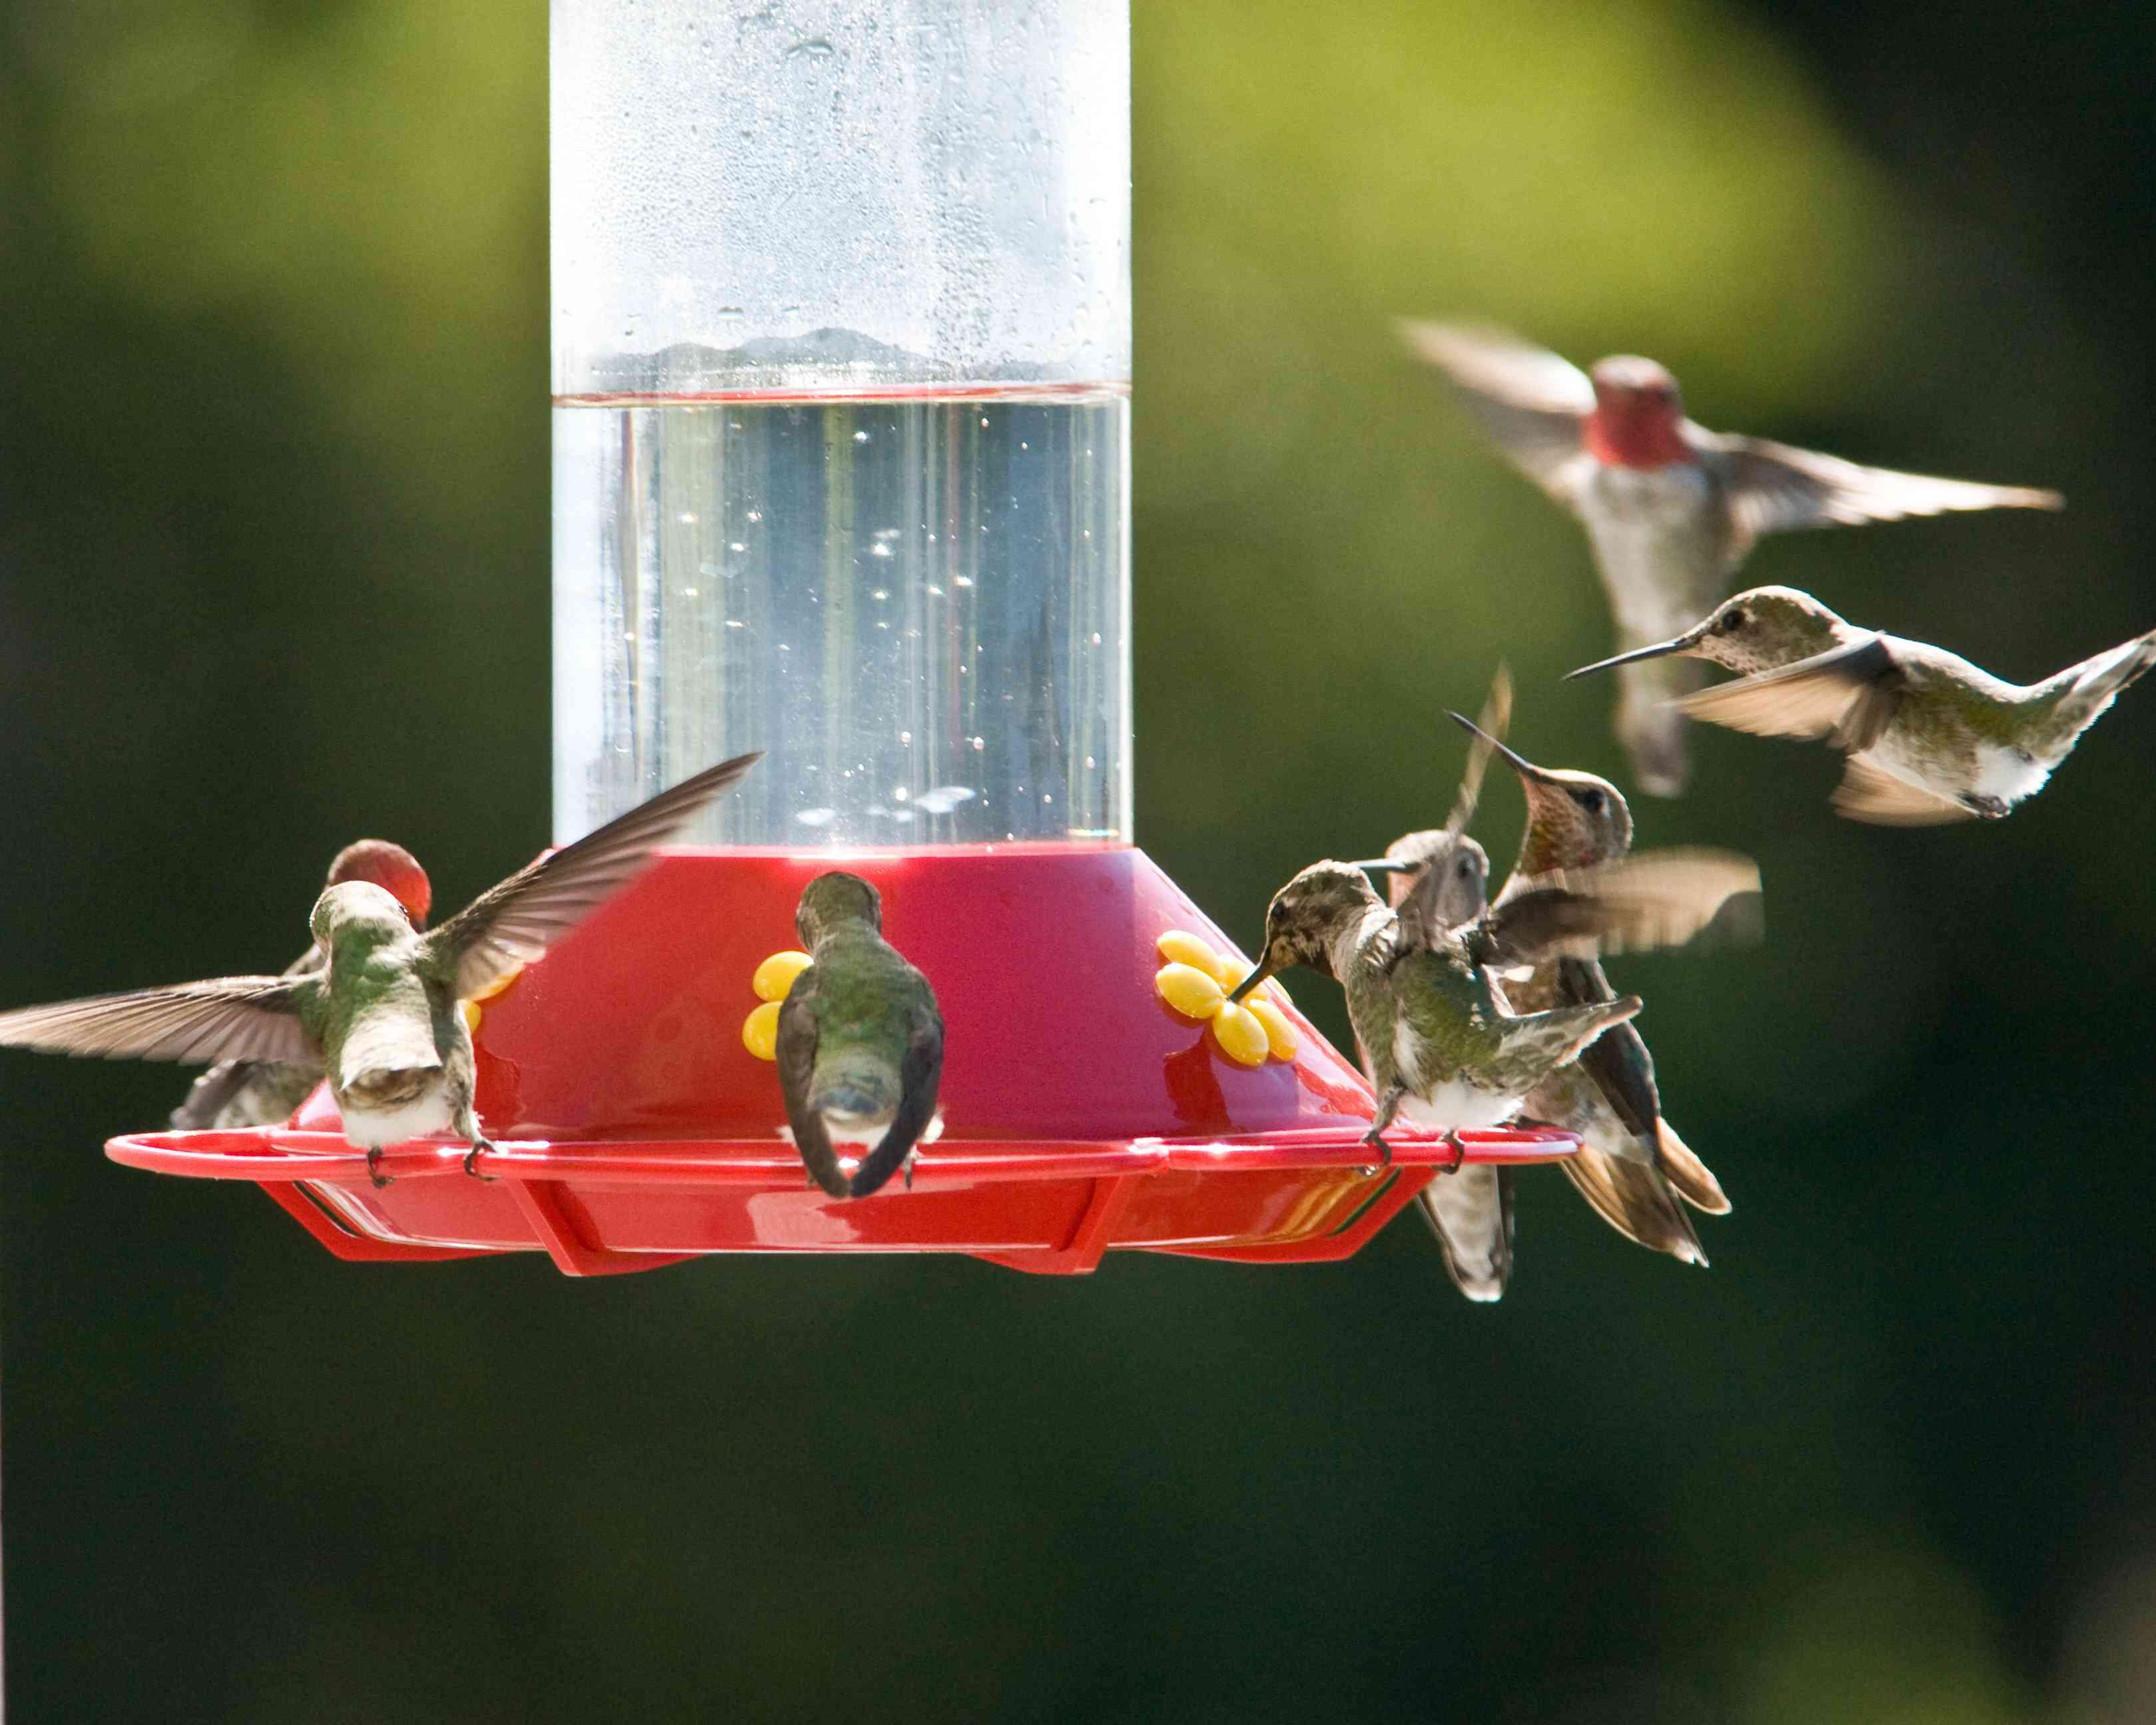 Several hummingbirds at a red feeder.